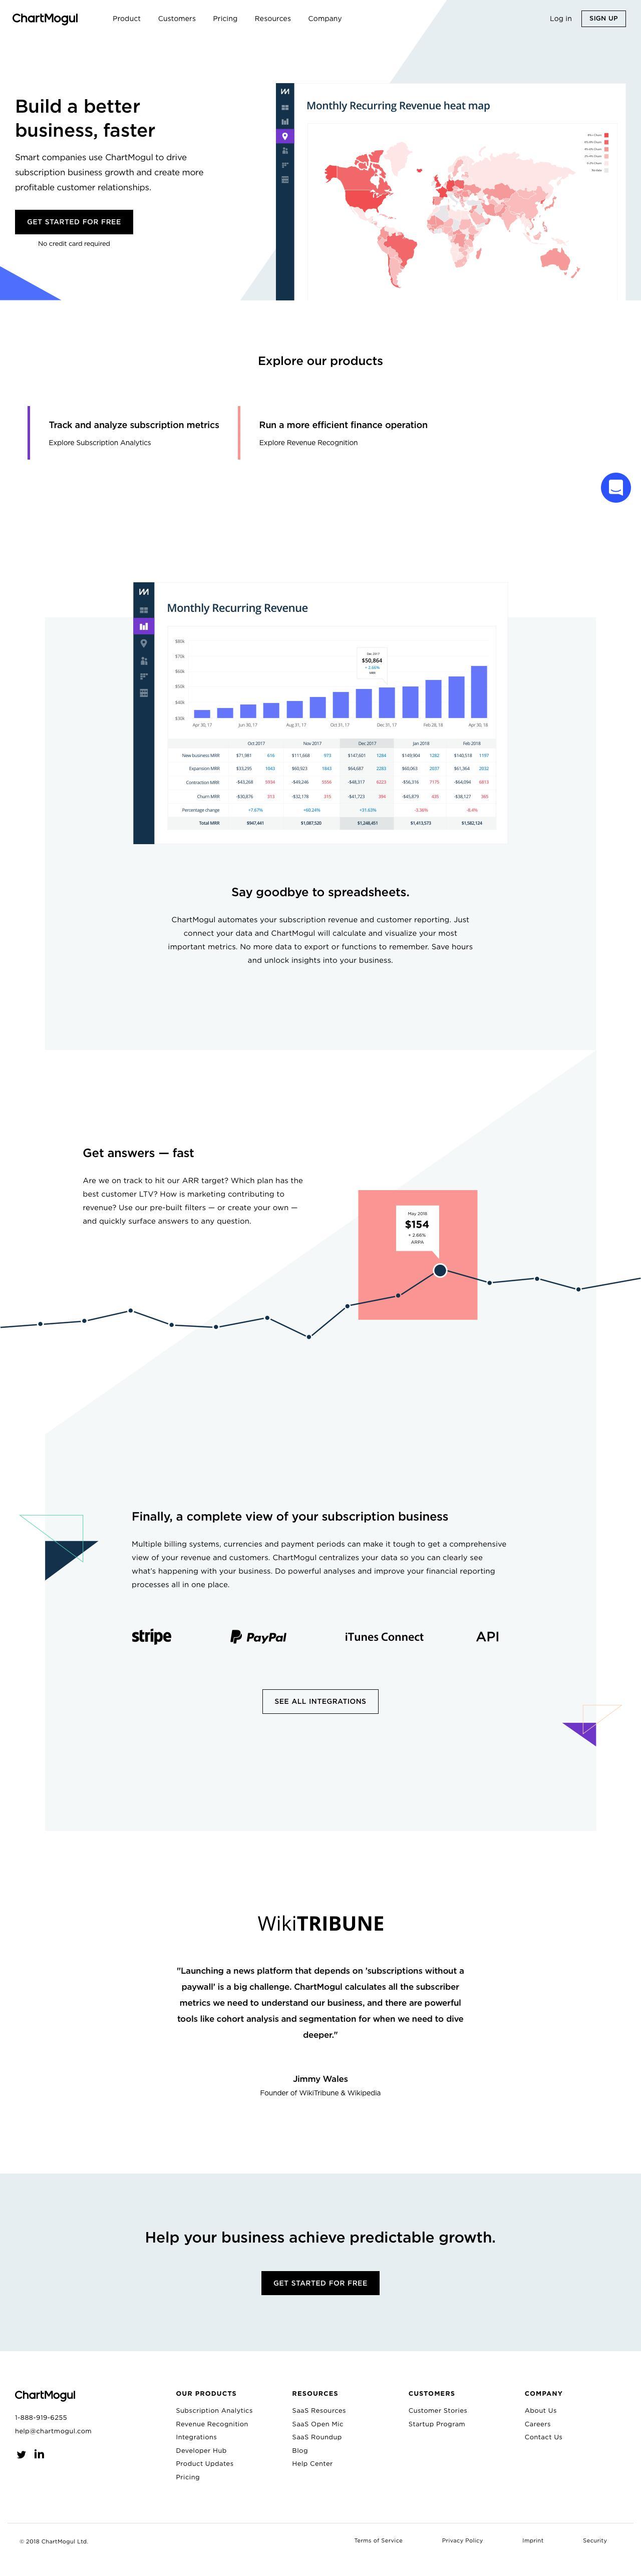 Screenshot of chartmogul.com - ChartMogul | Subscription Analytics and Revenue Reporting - captured June 14, 2018